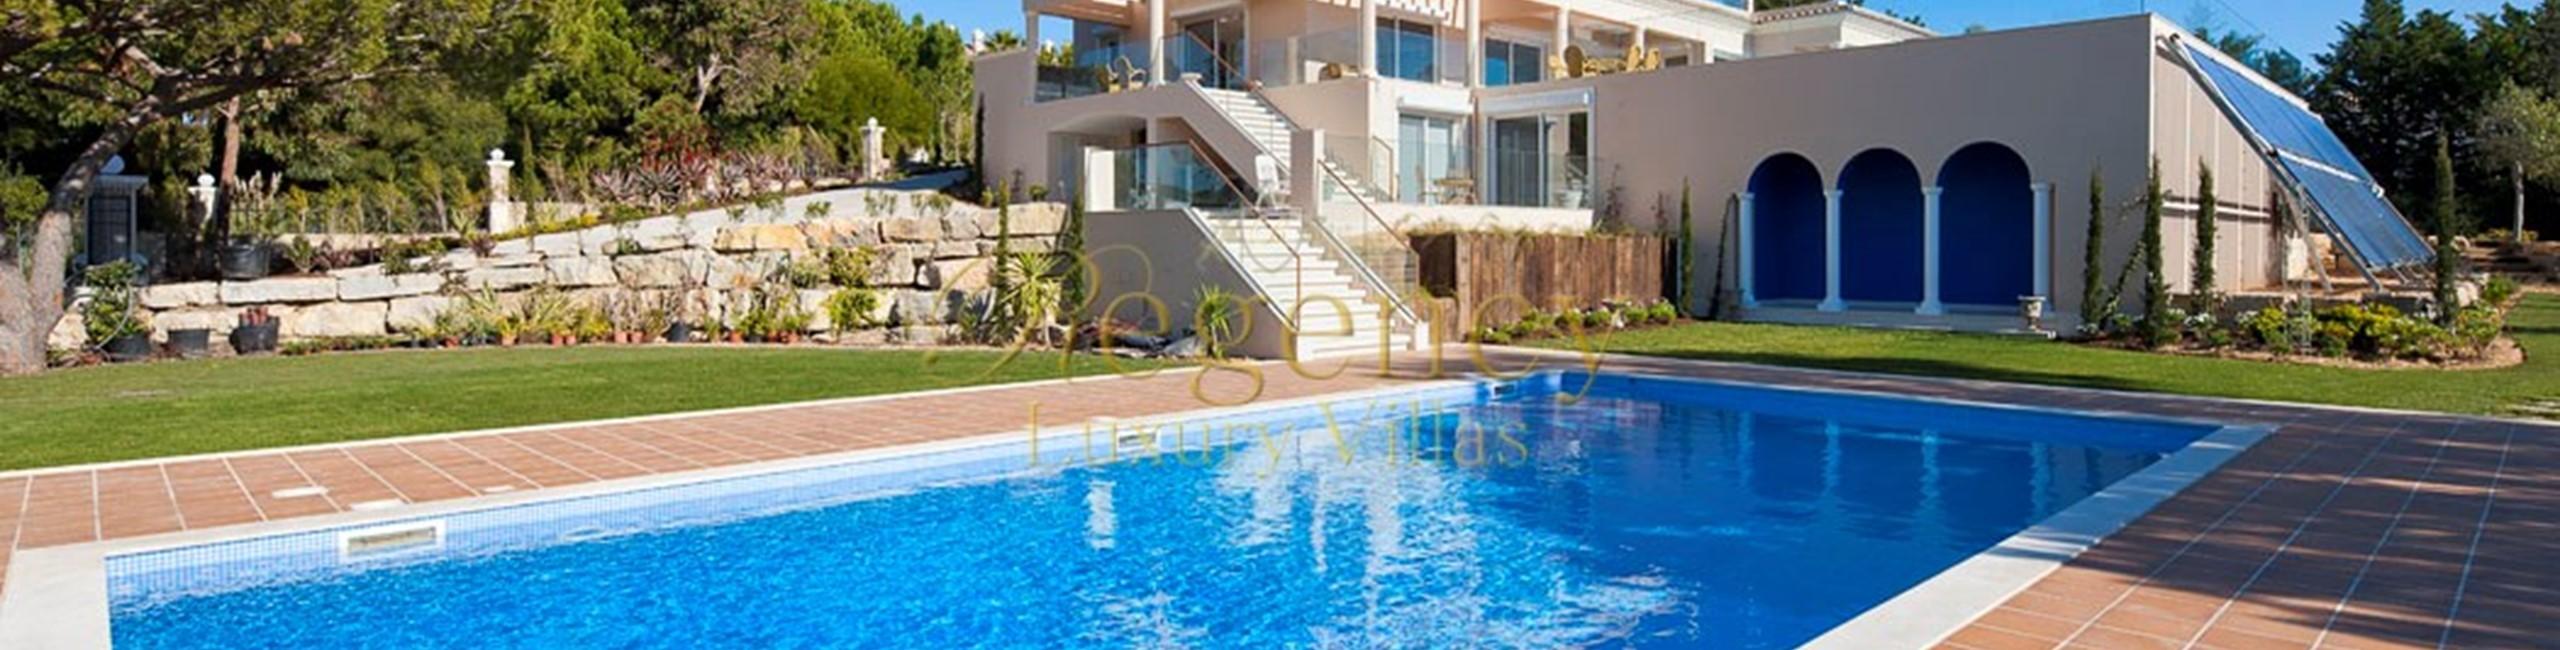 Luxury Elegant Villa With 6 Bed Family Holidays Quinta Do Lago Algarve RLV 1